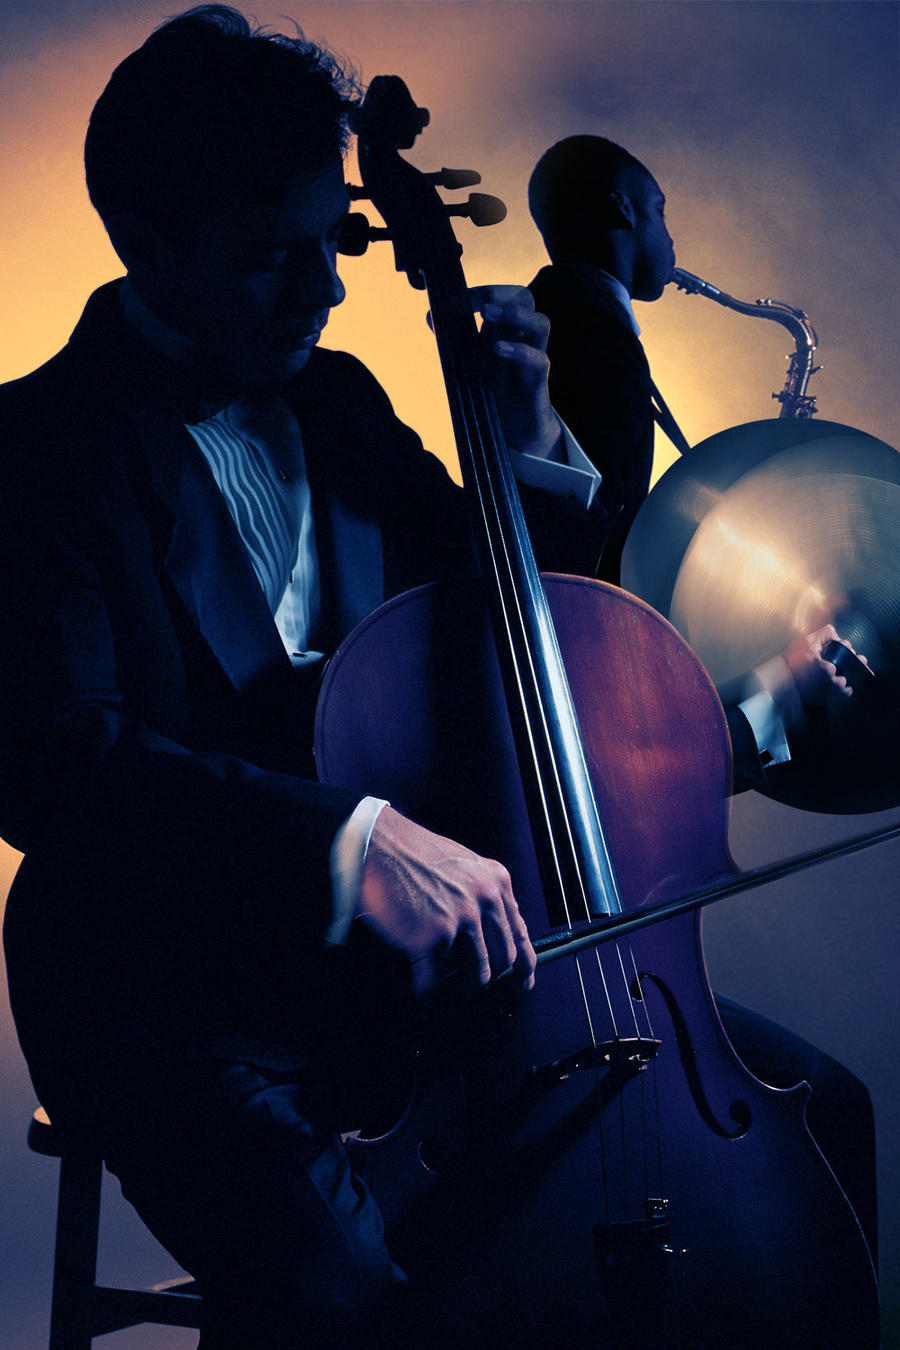 Jazz  Evevning by makog